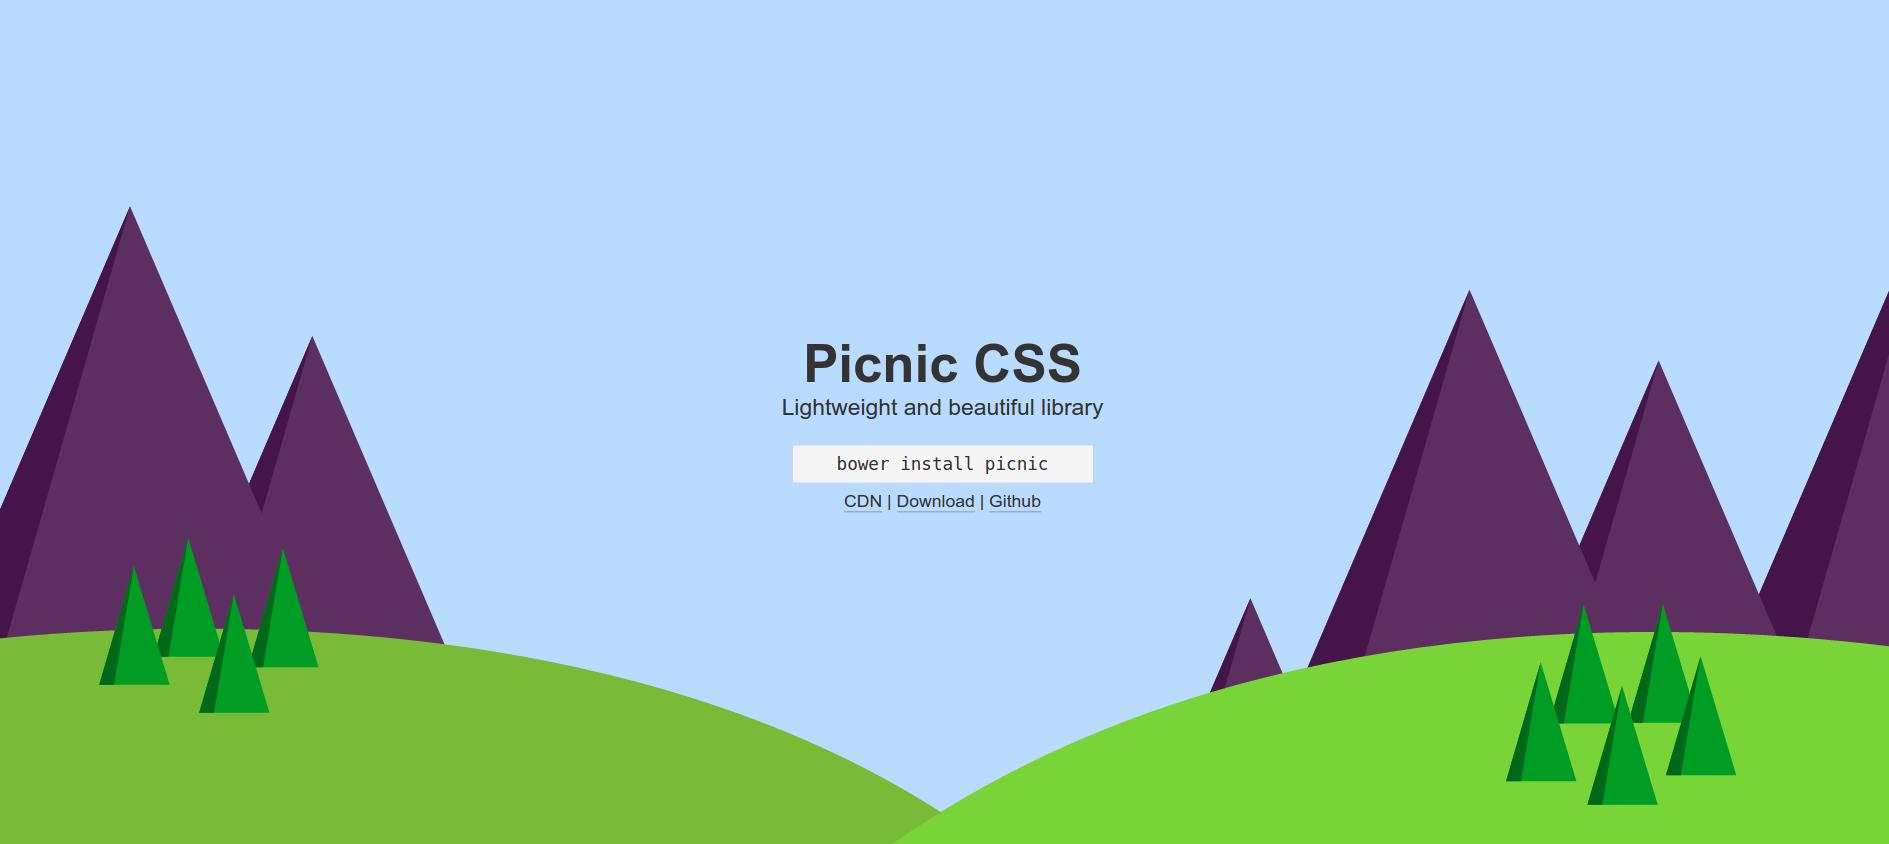 7_picnic.png